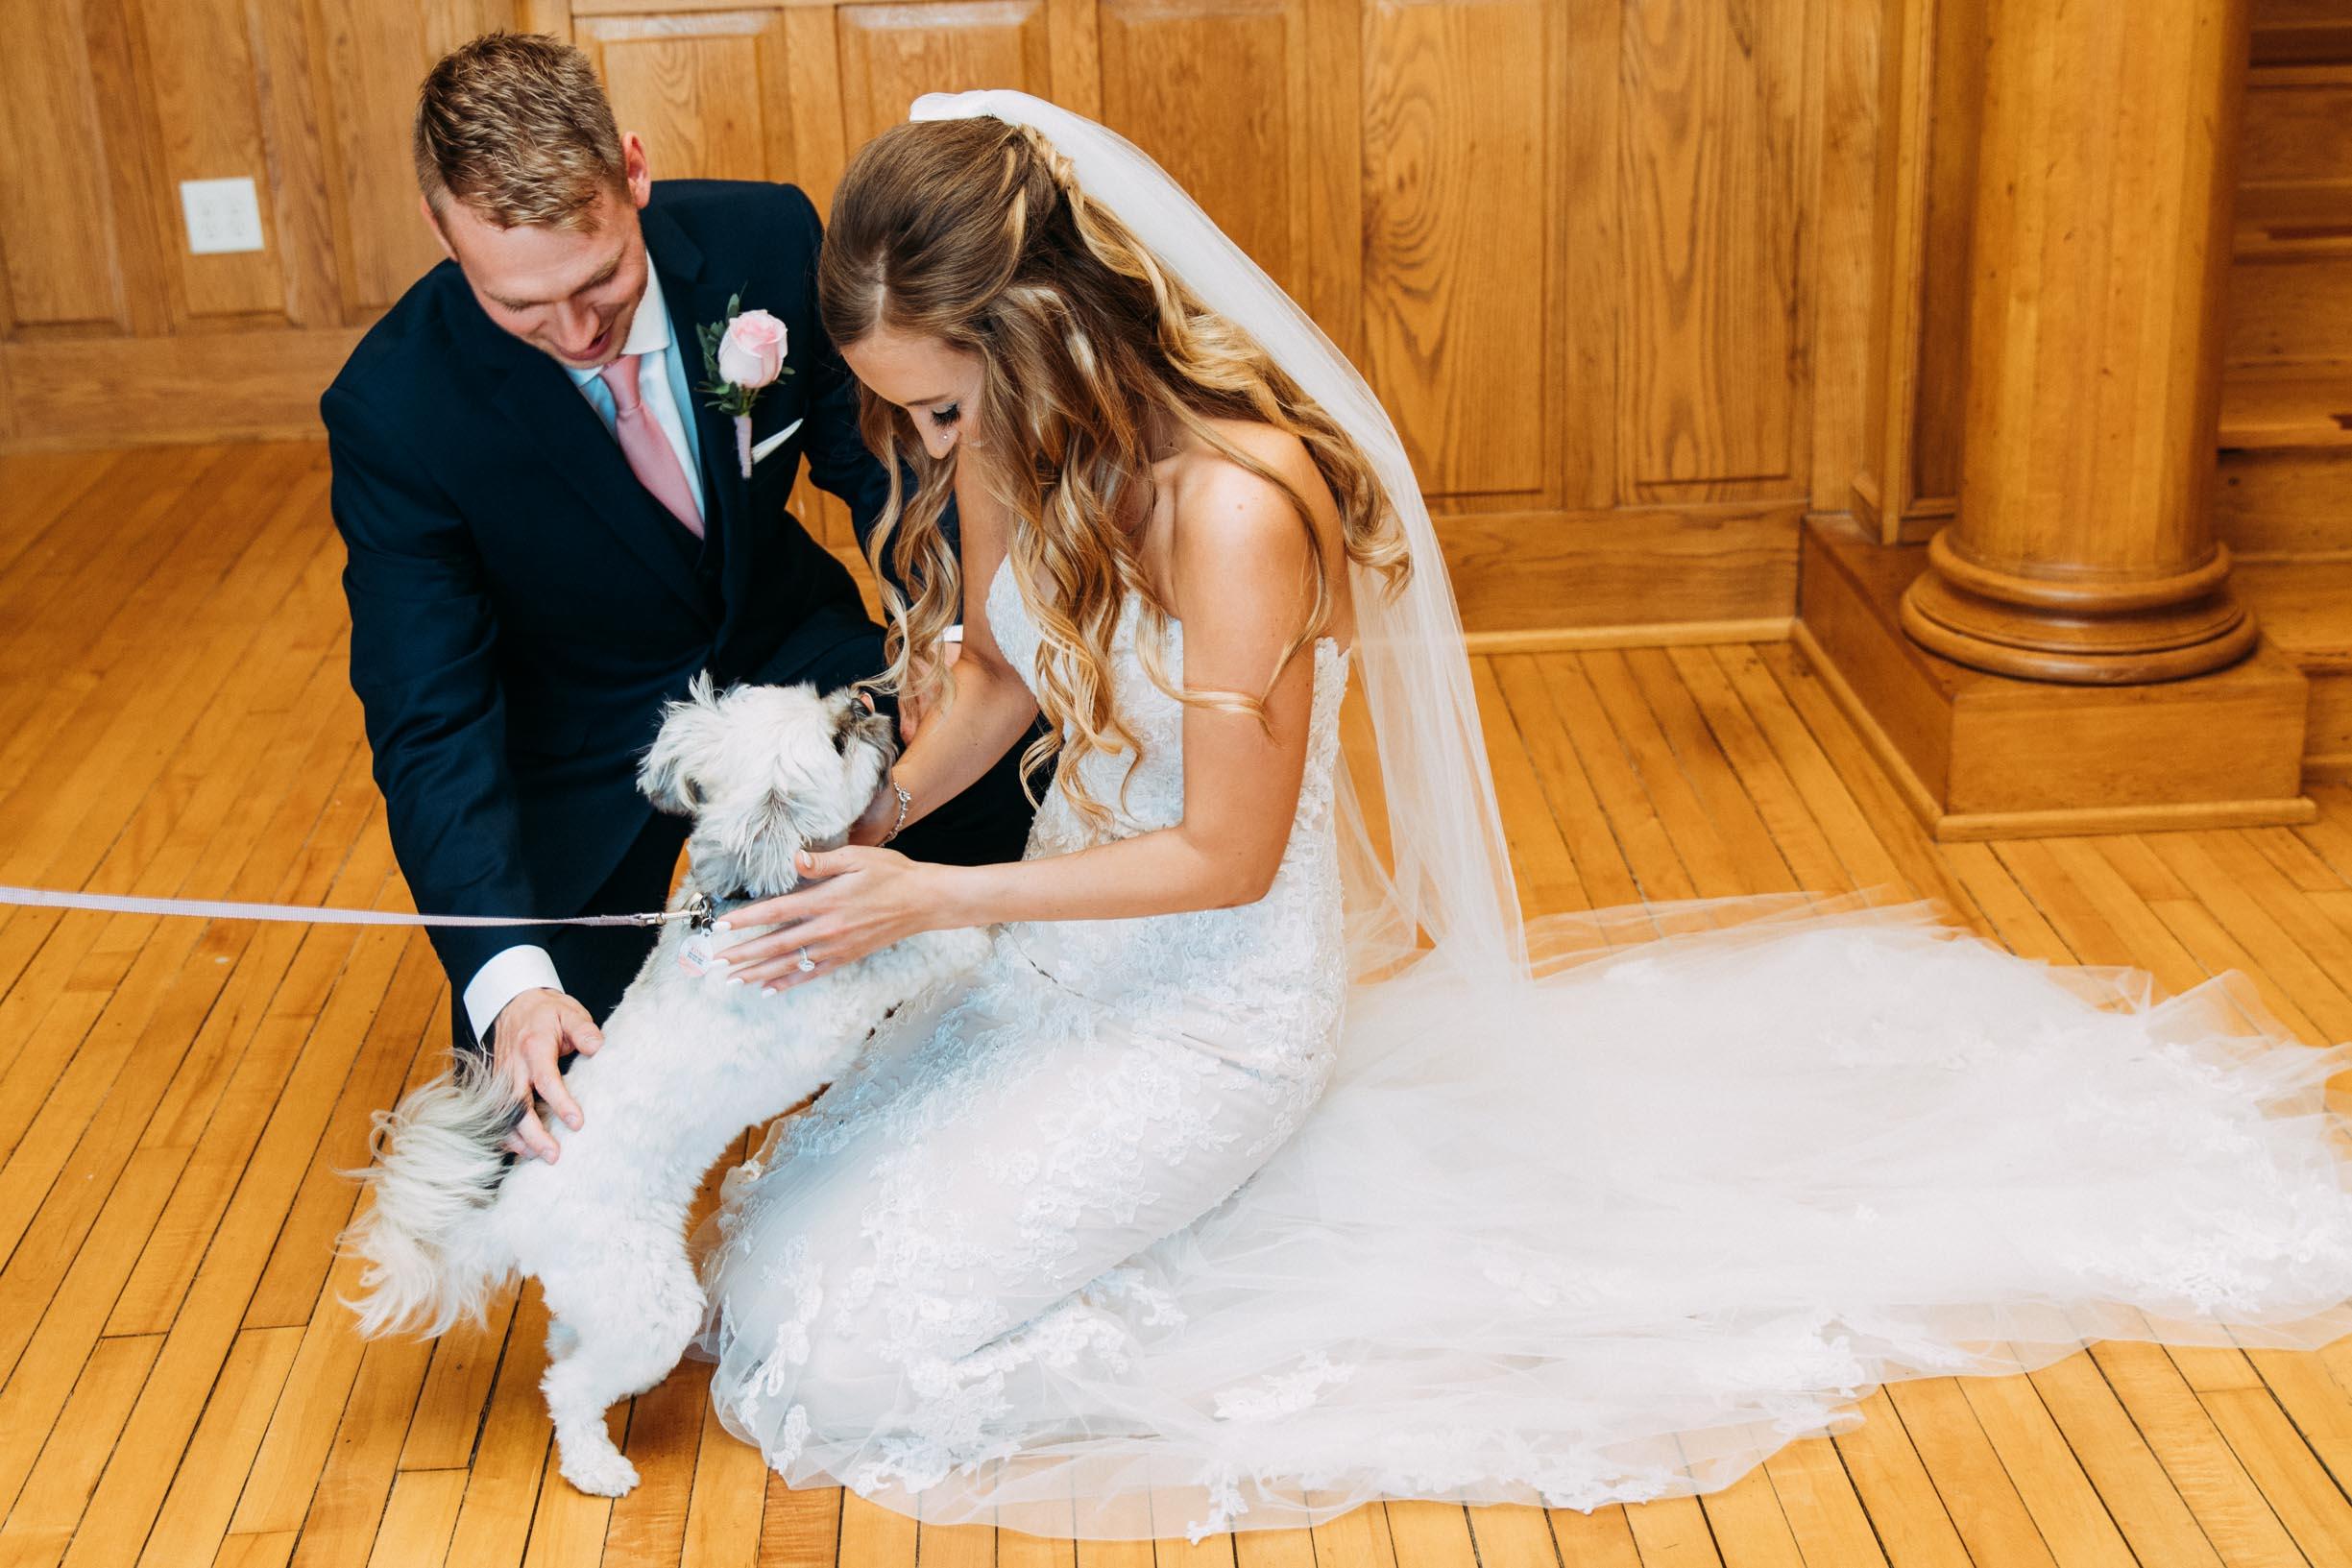 18-WeddingsattheBroz_Minnesota_WeddingBlog.jpg